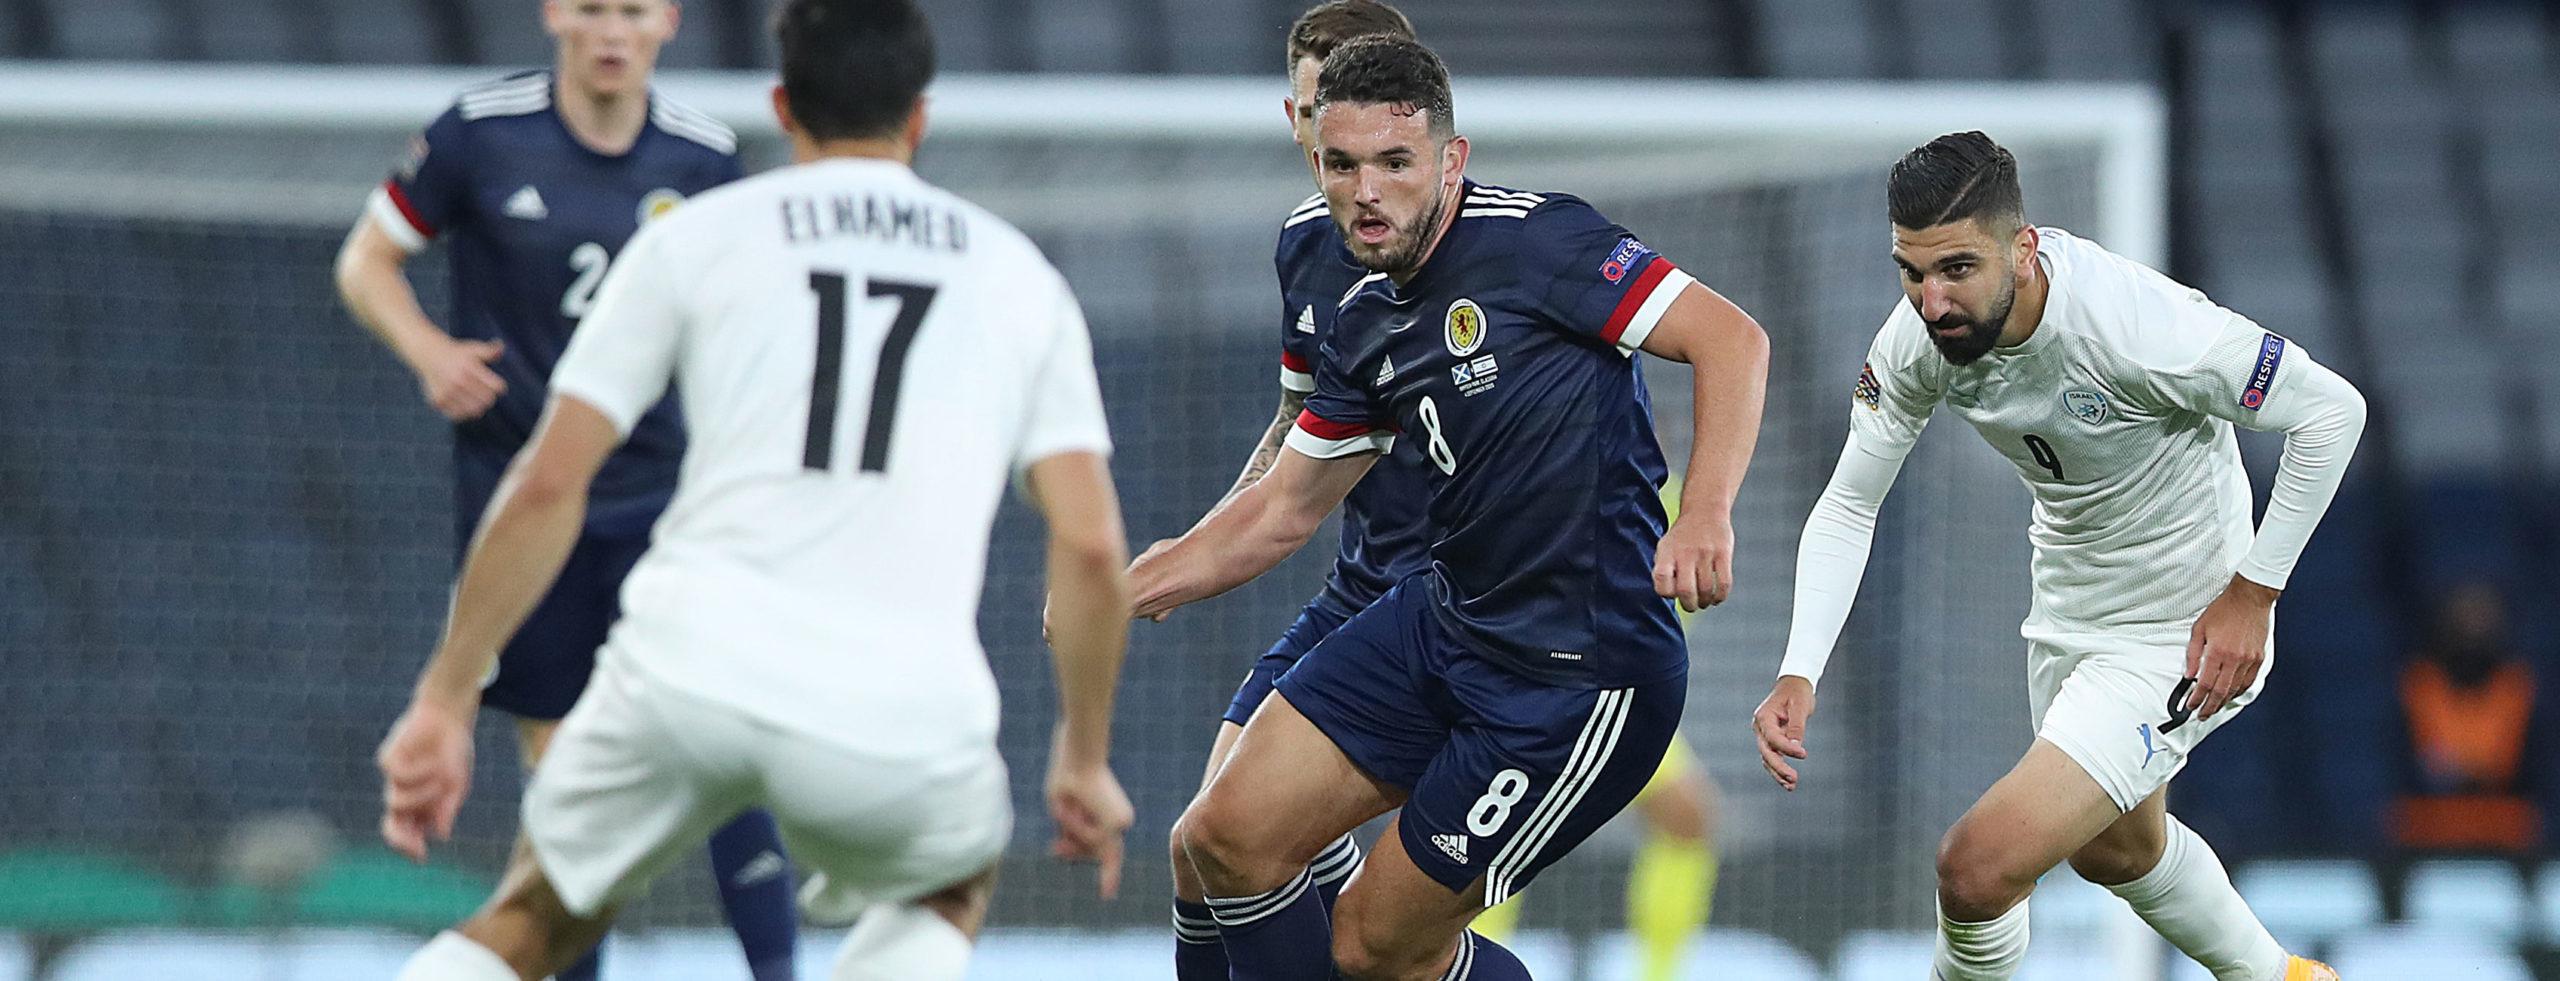 Israel vs Scotland: Familiar foes well matched